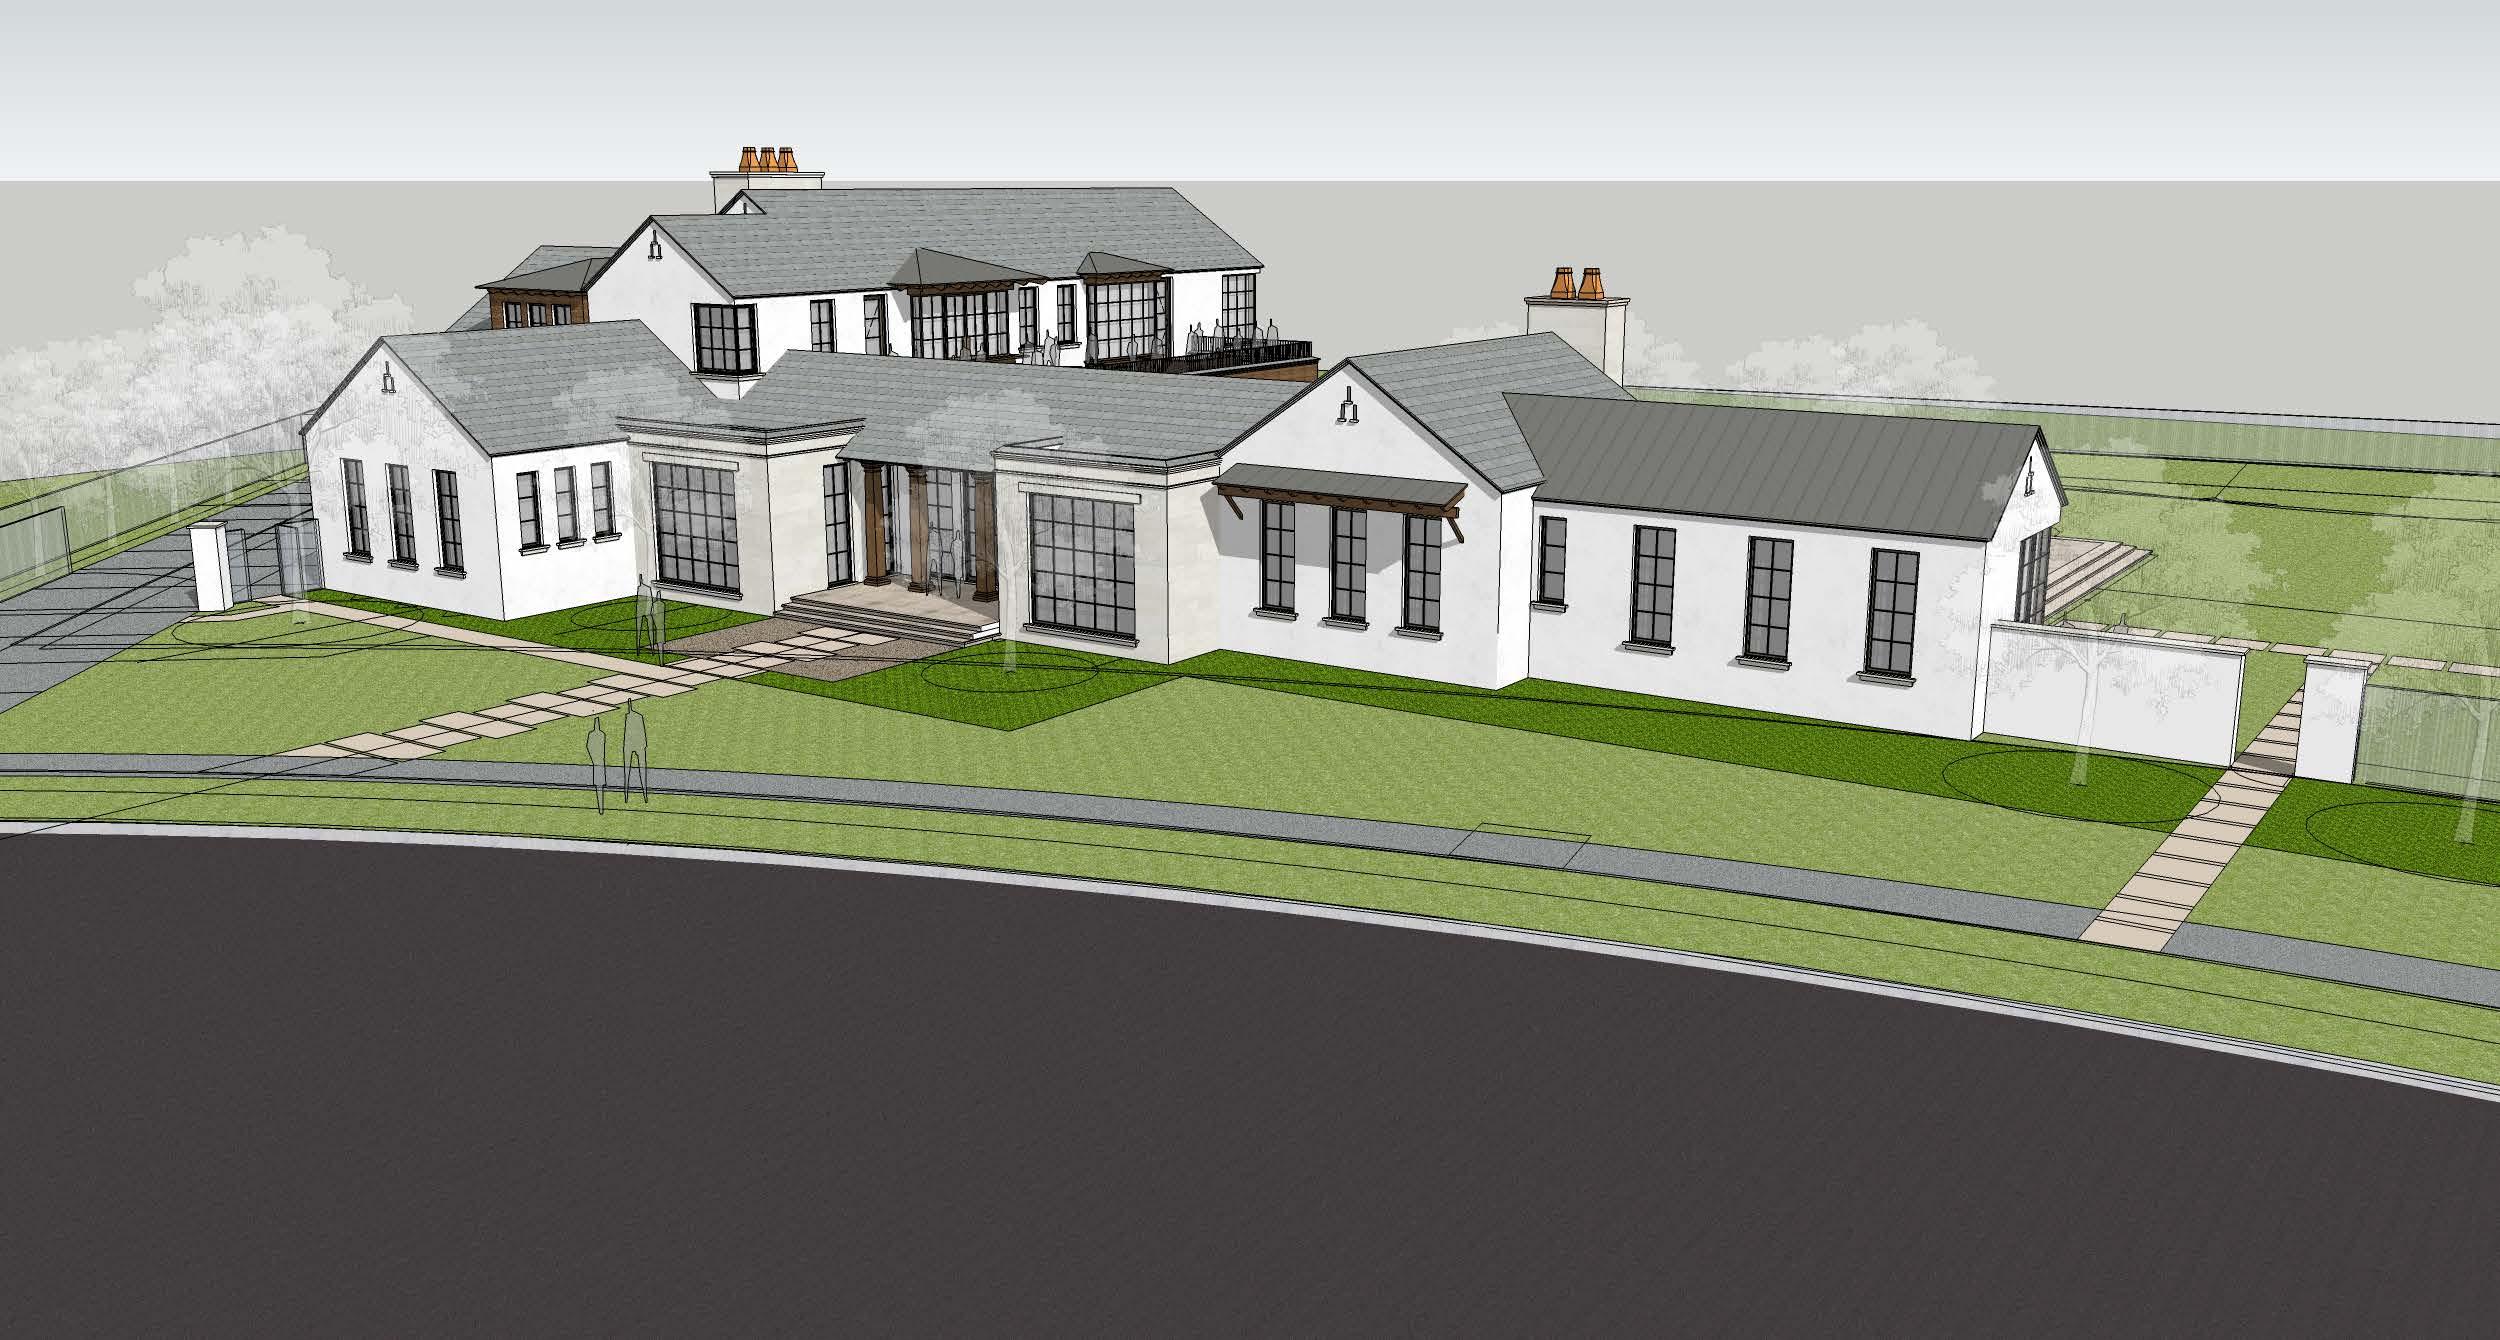 17-080_Vyas Residence_Model Views_Design Review_Page_1.jpg